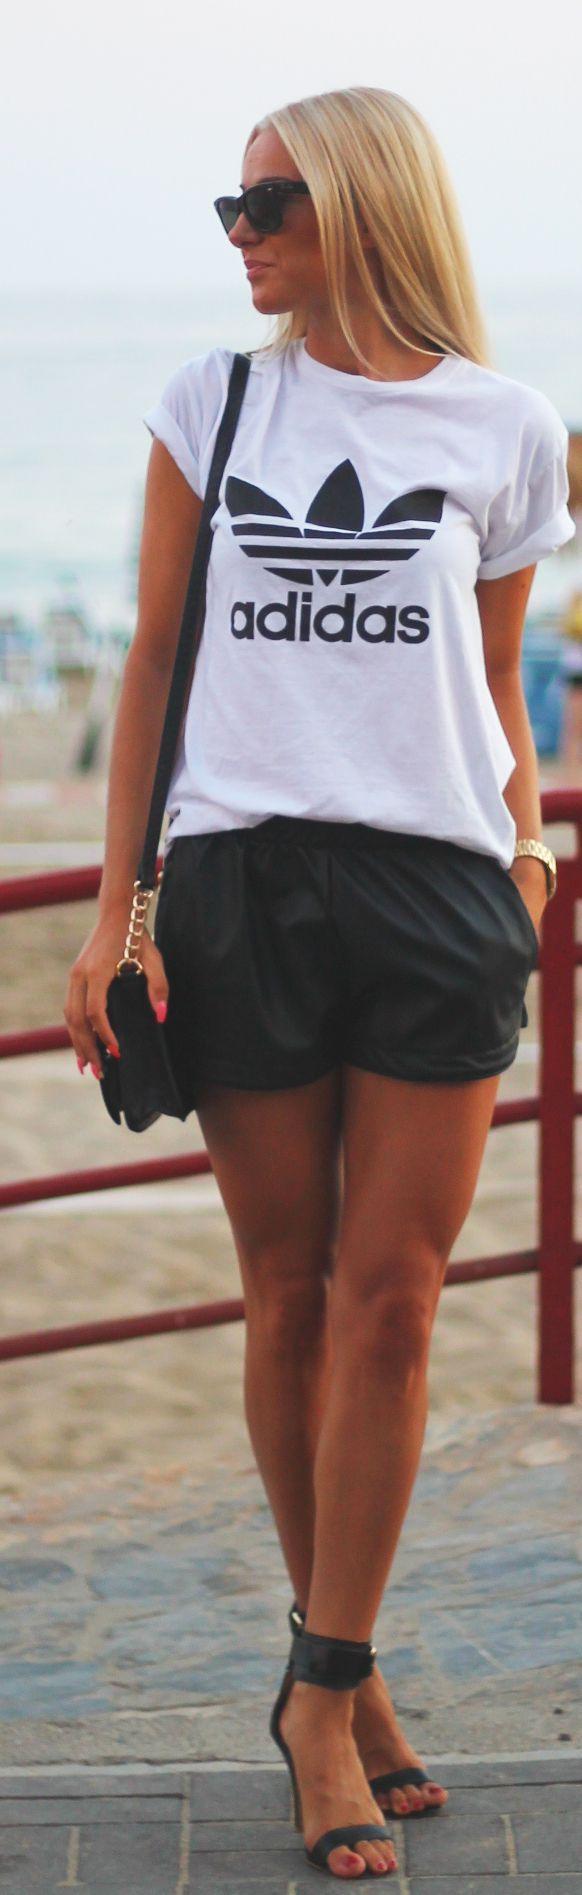 Adidas black & white basic sporty printed T-shirt, shorts, bag, shandals.